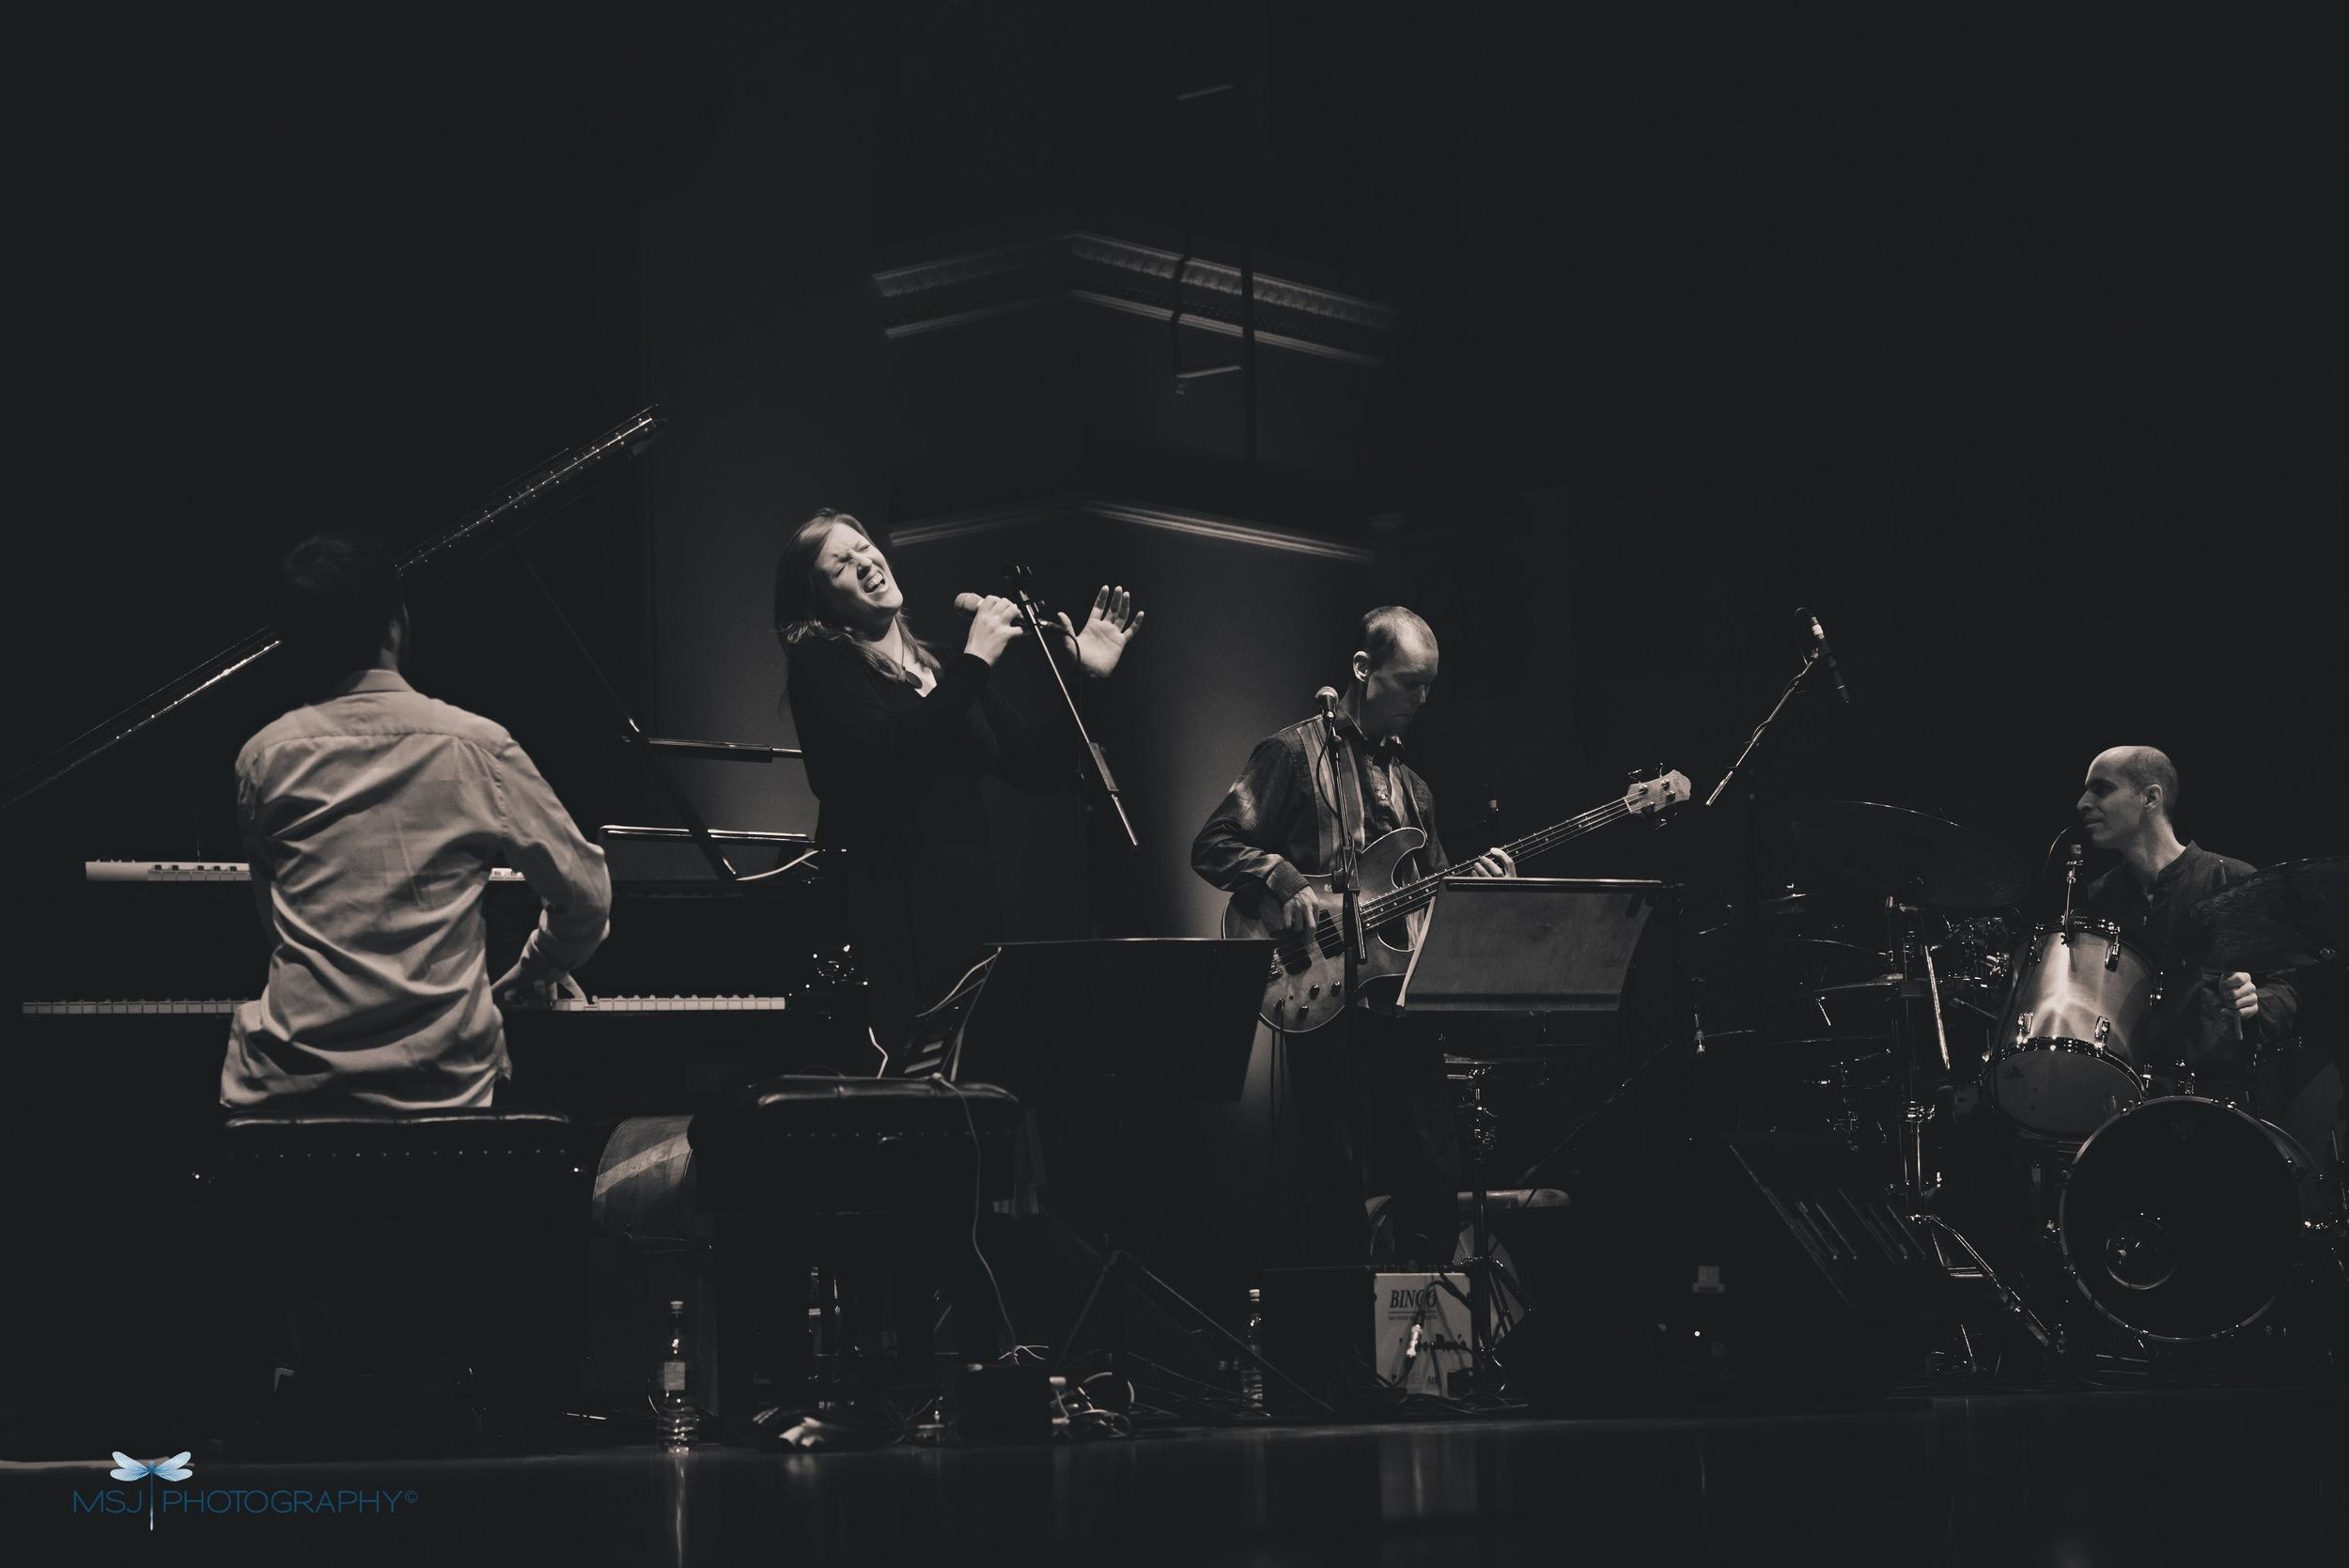 Photo by Monika S.Jakubowska